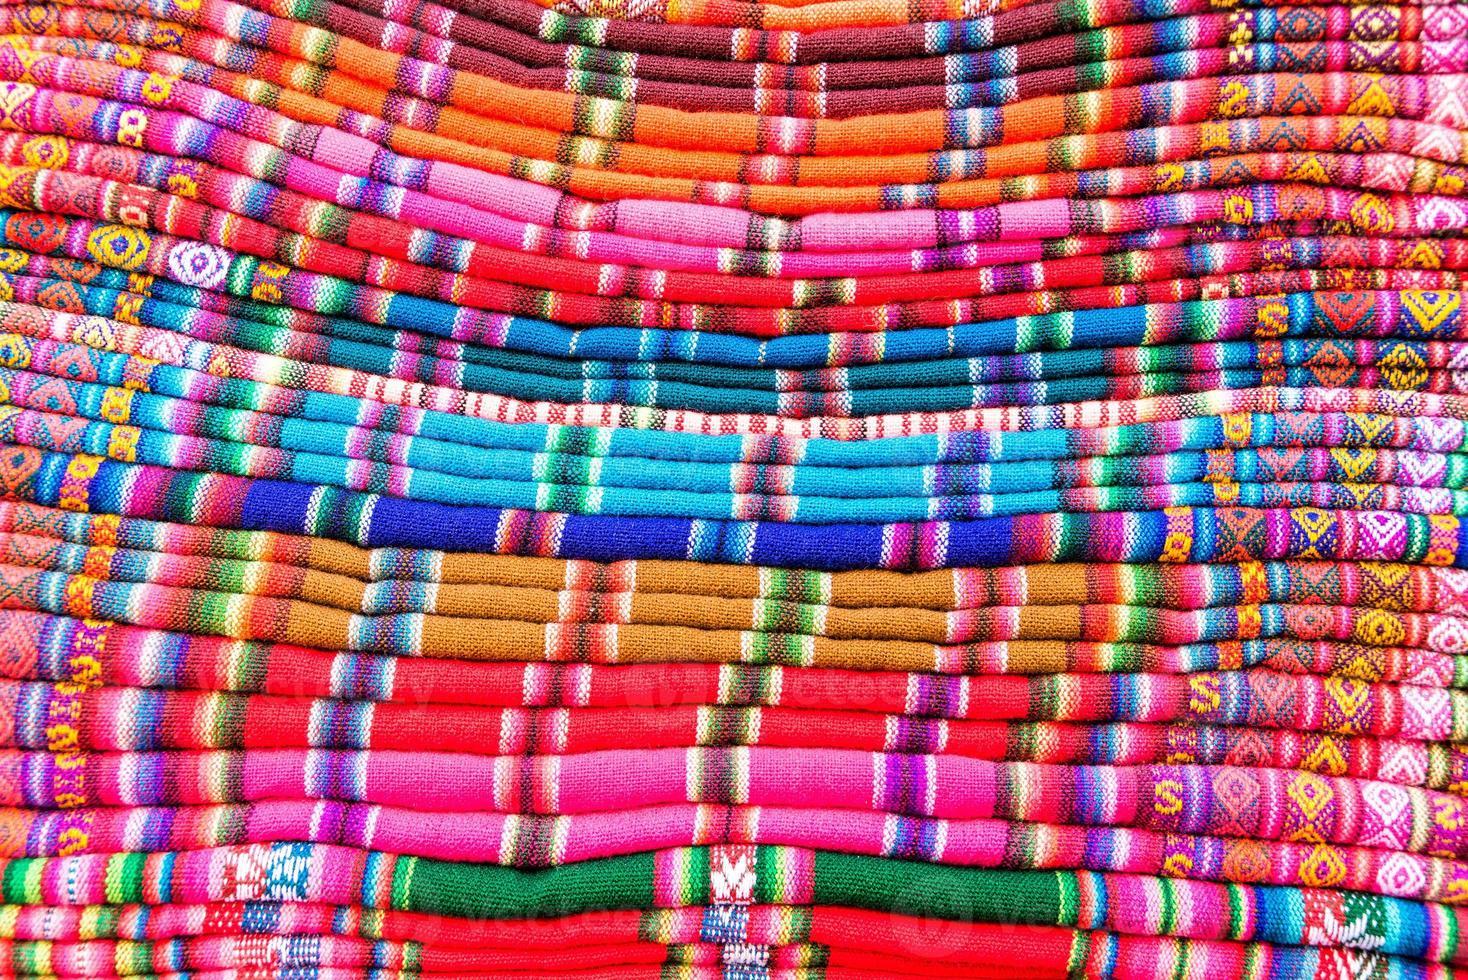 tessuti colorati in bolivia foto